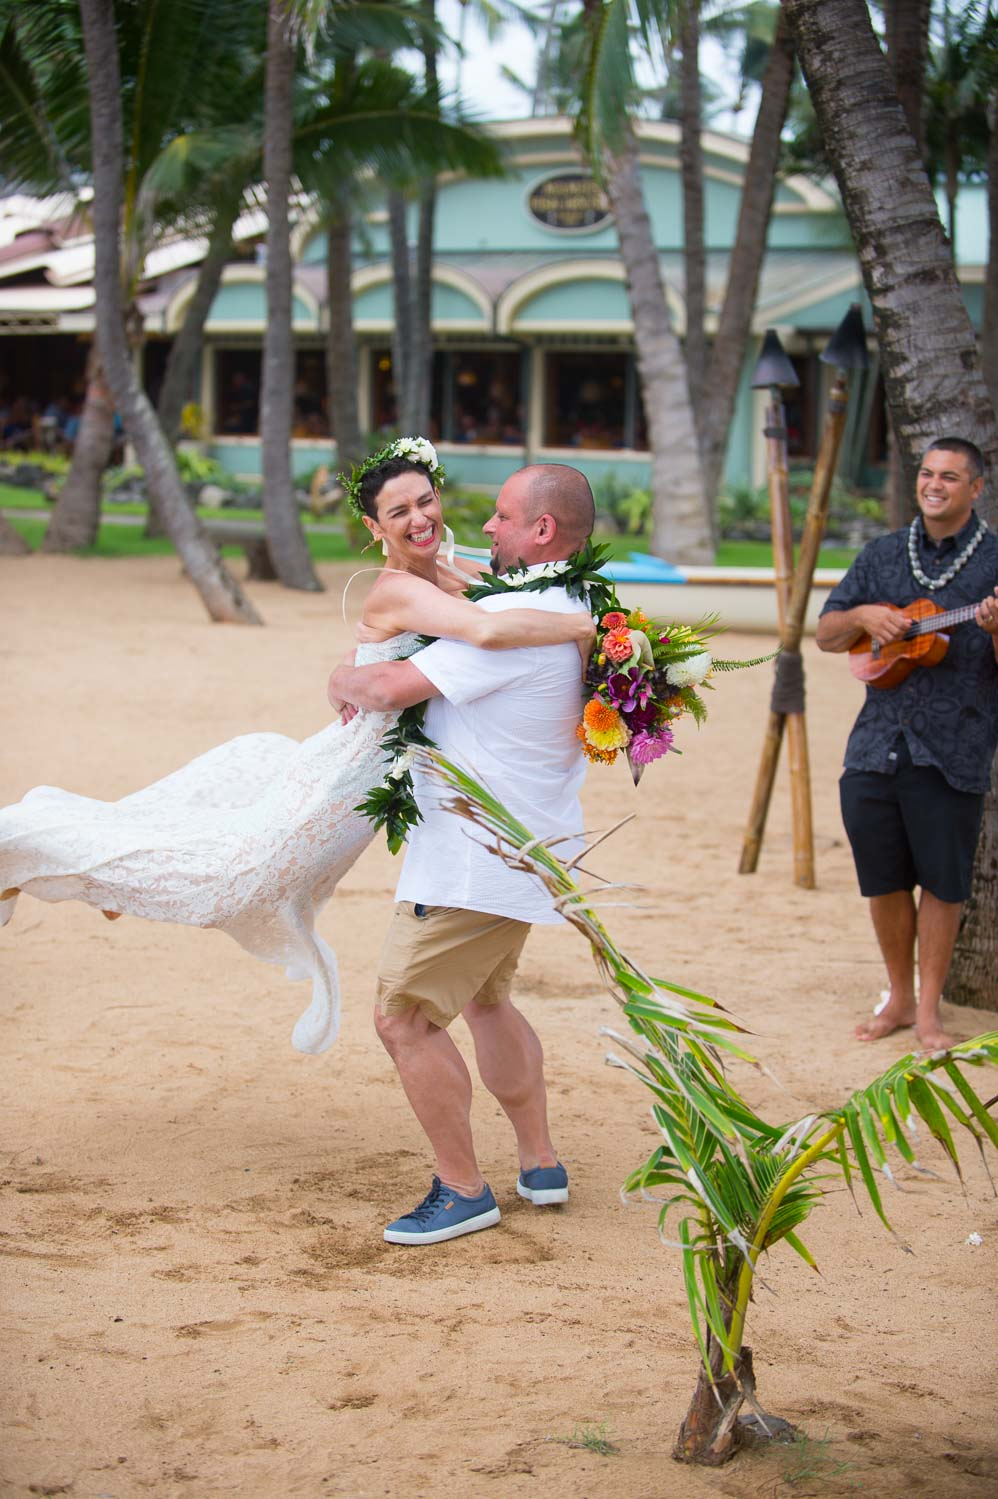 maui-wedding-photography-maui-wedding-venue-Tad-Craig-Photography-43.jpg